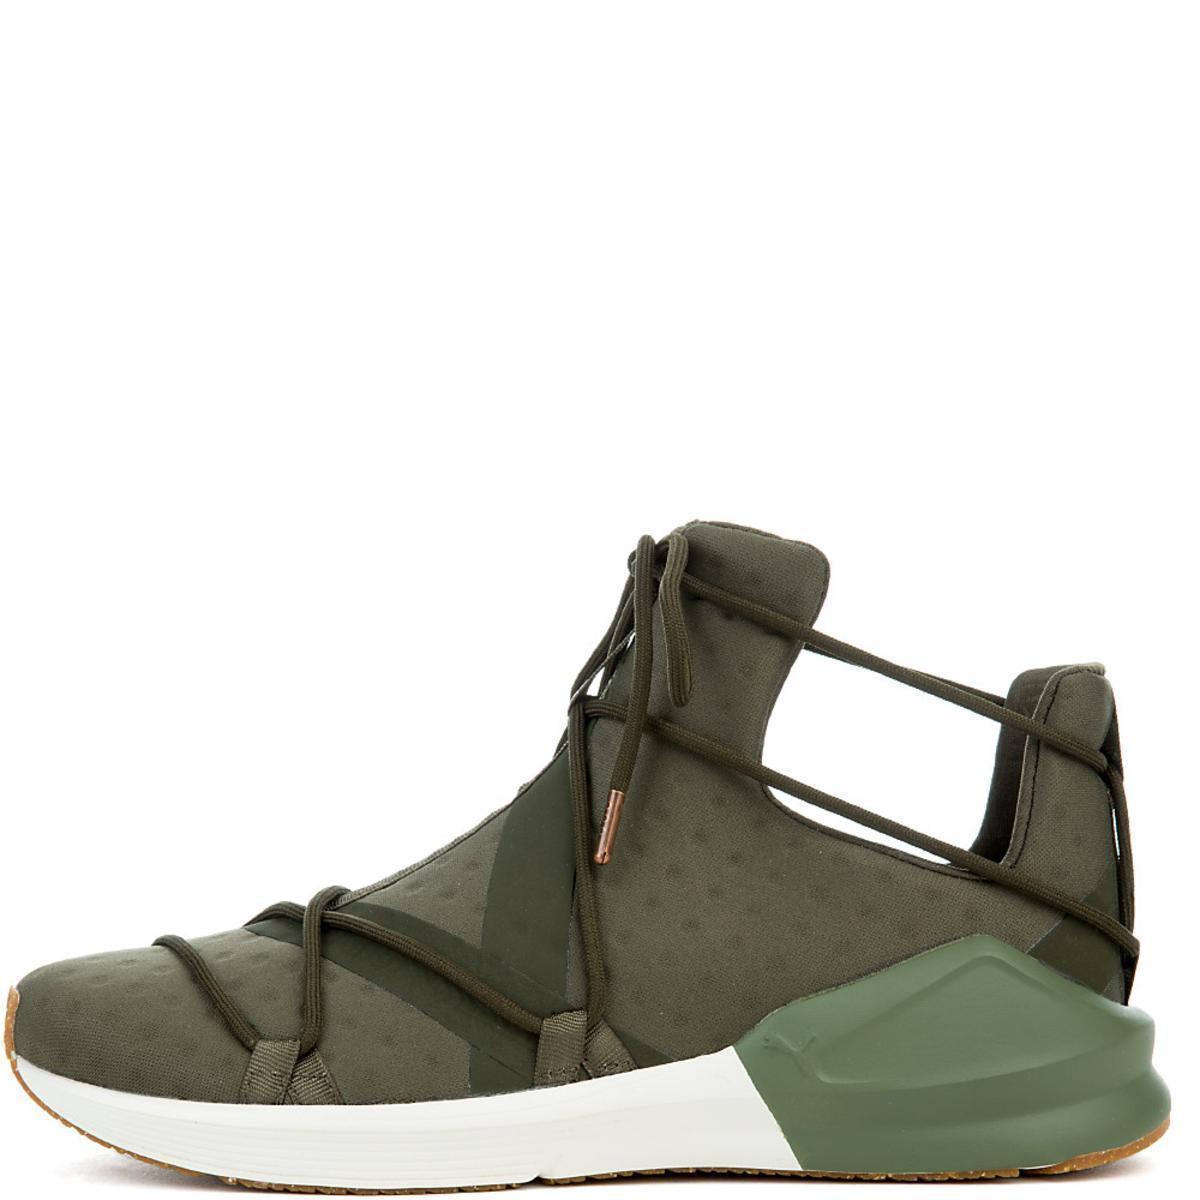 a0eec0f5b5d Lyst - PUMA Fierce Rope Vr Sneaker in Green